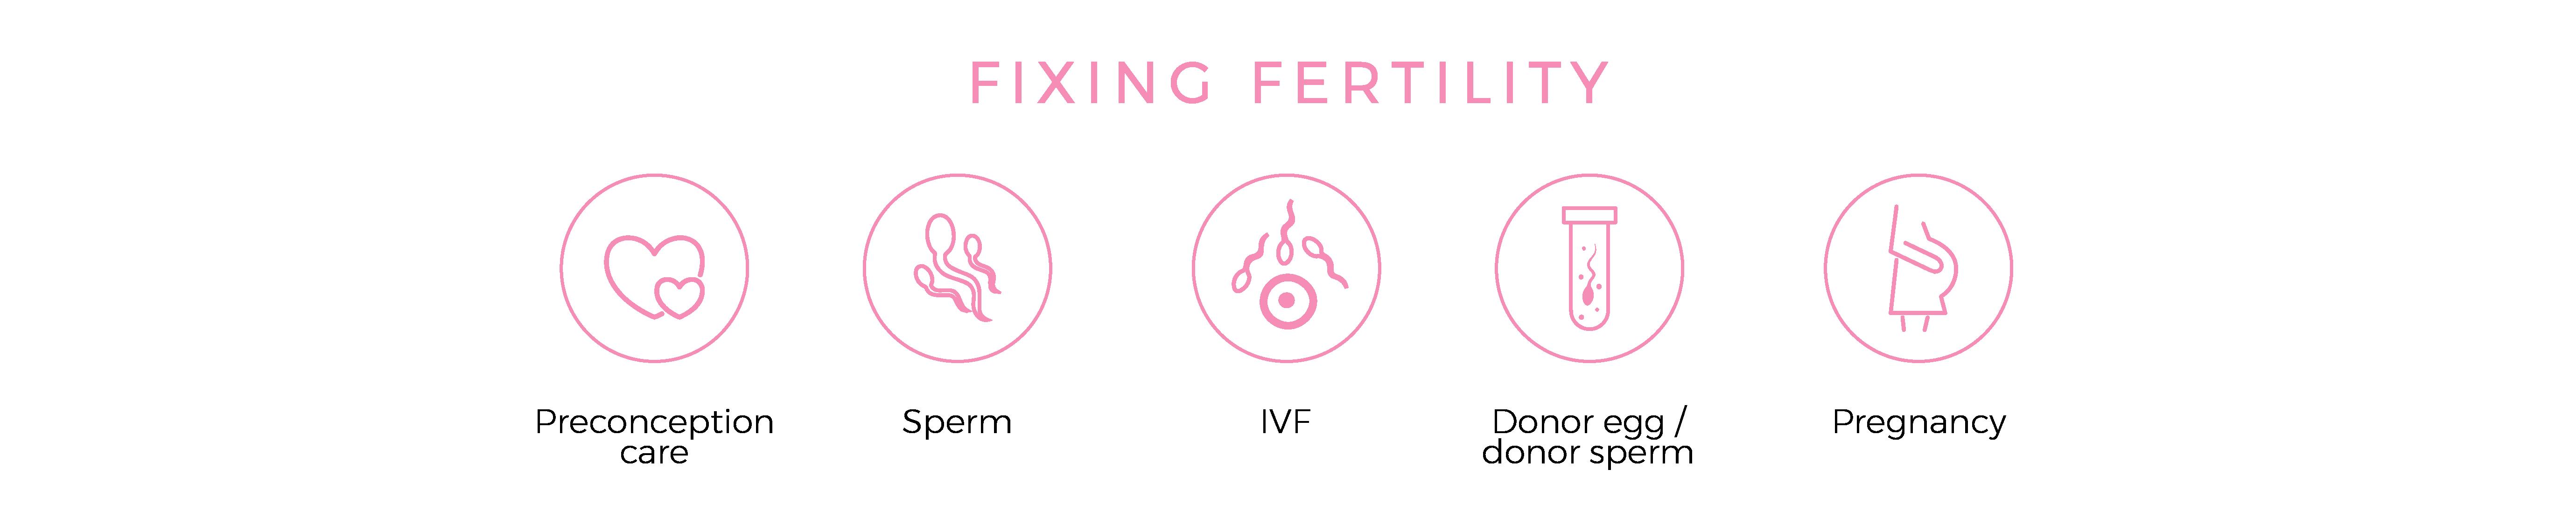 Fixing Fertility Icons 2 01